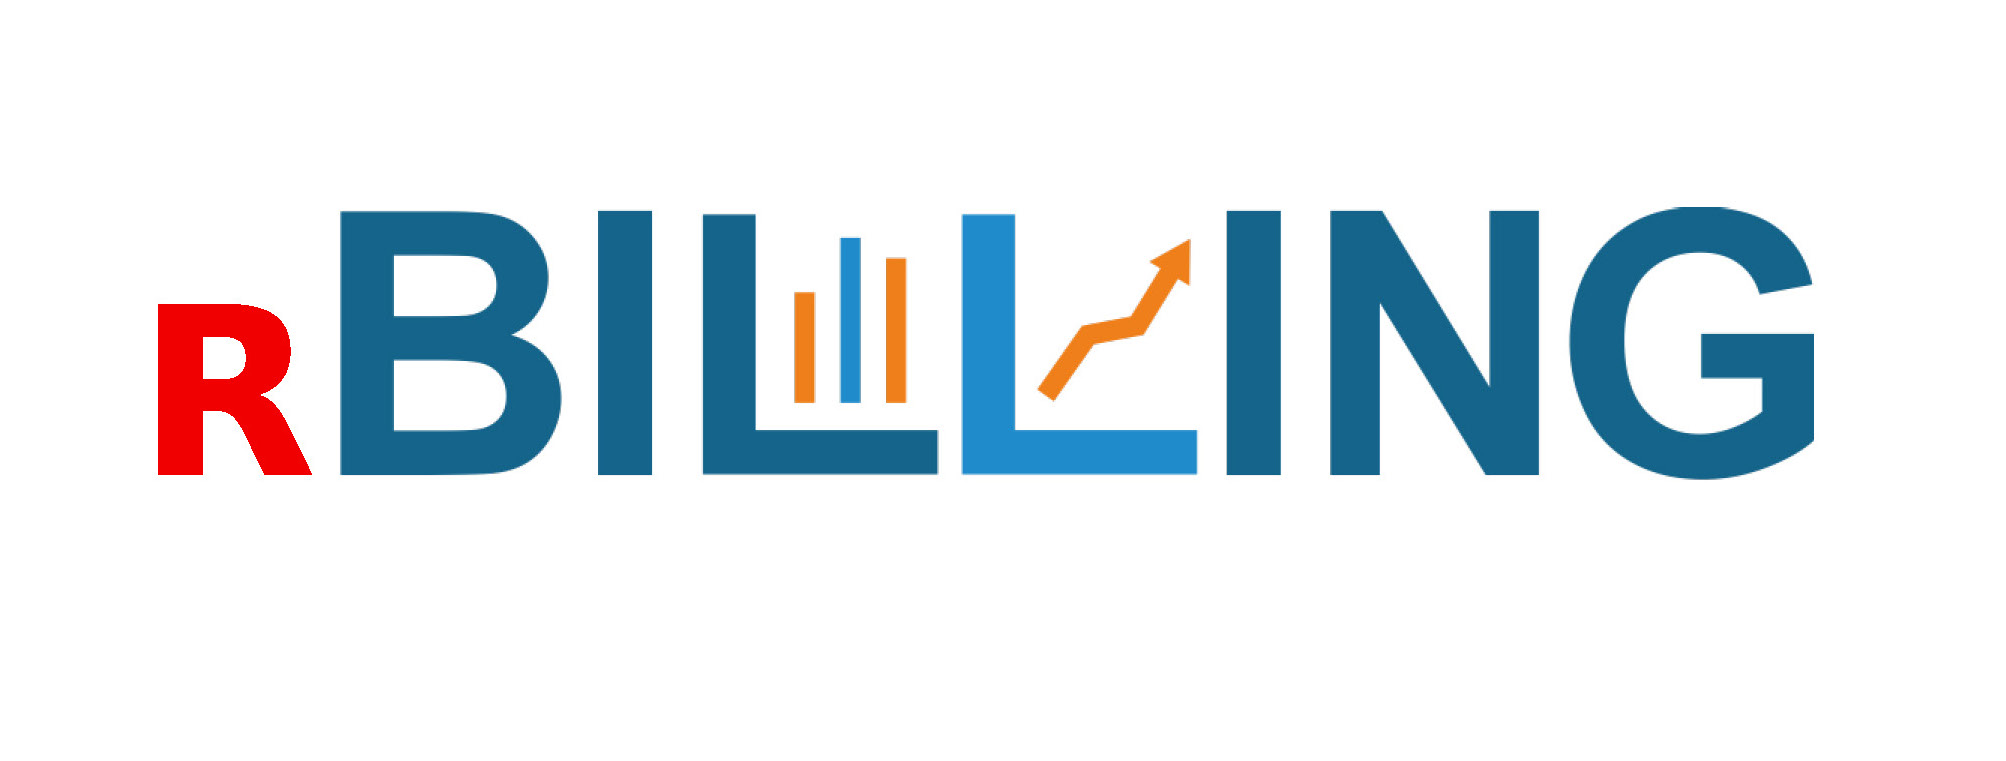 160927-rbilling-logo-01